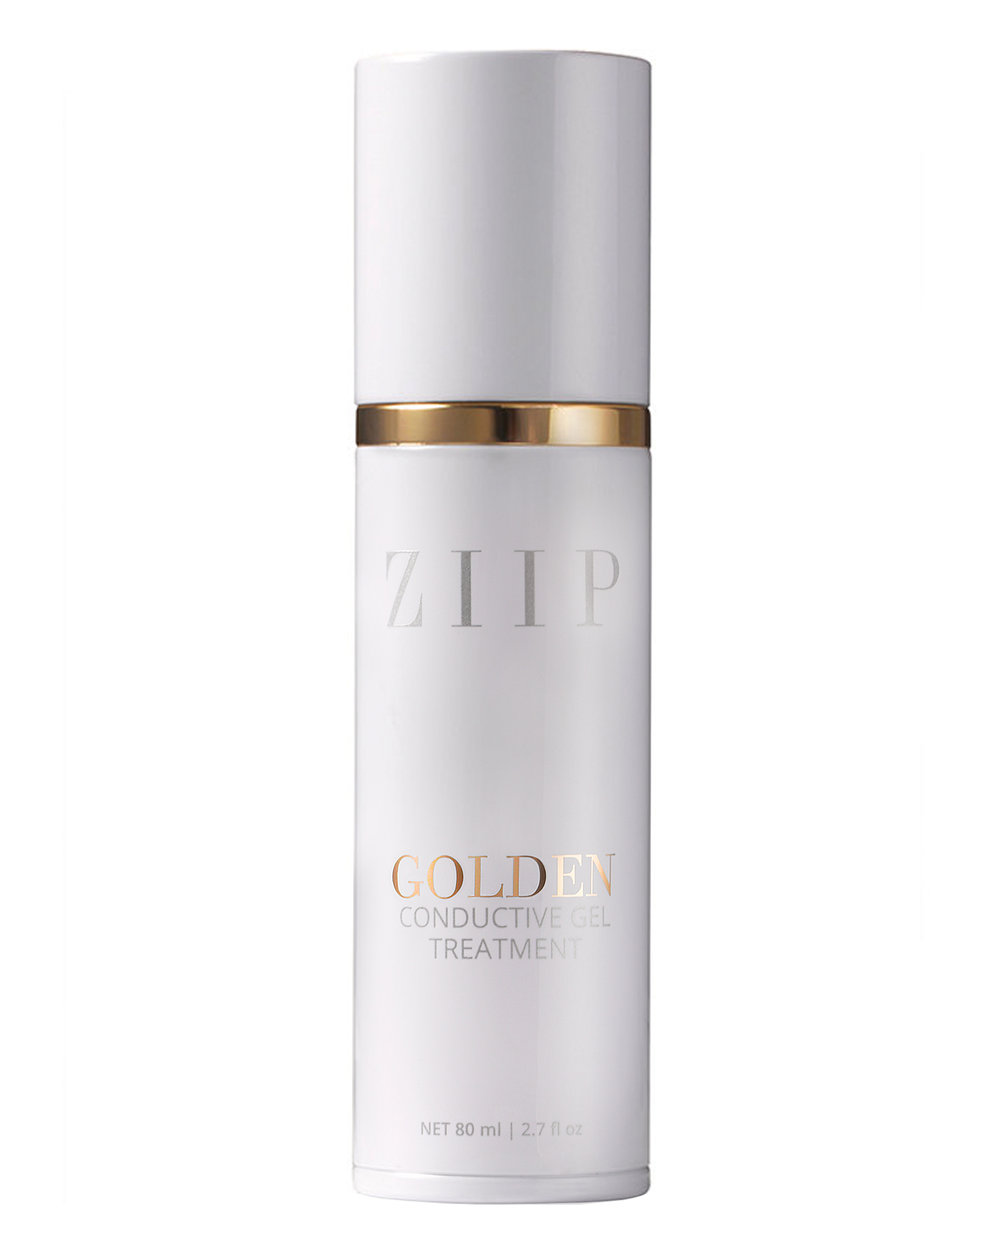 zip002_ziip_goldenconductivegel-treatment_1_1560x1960-x9z79.jpg